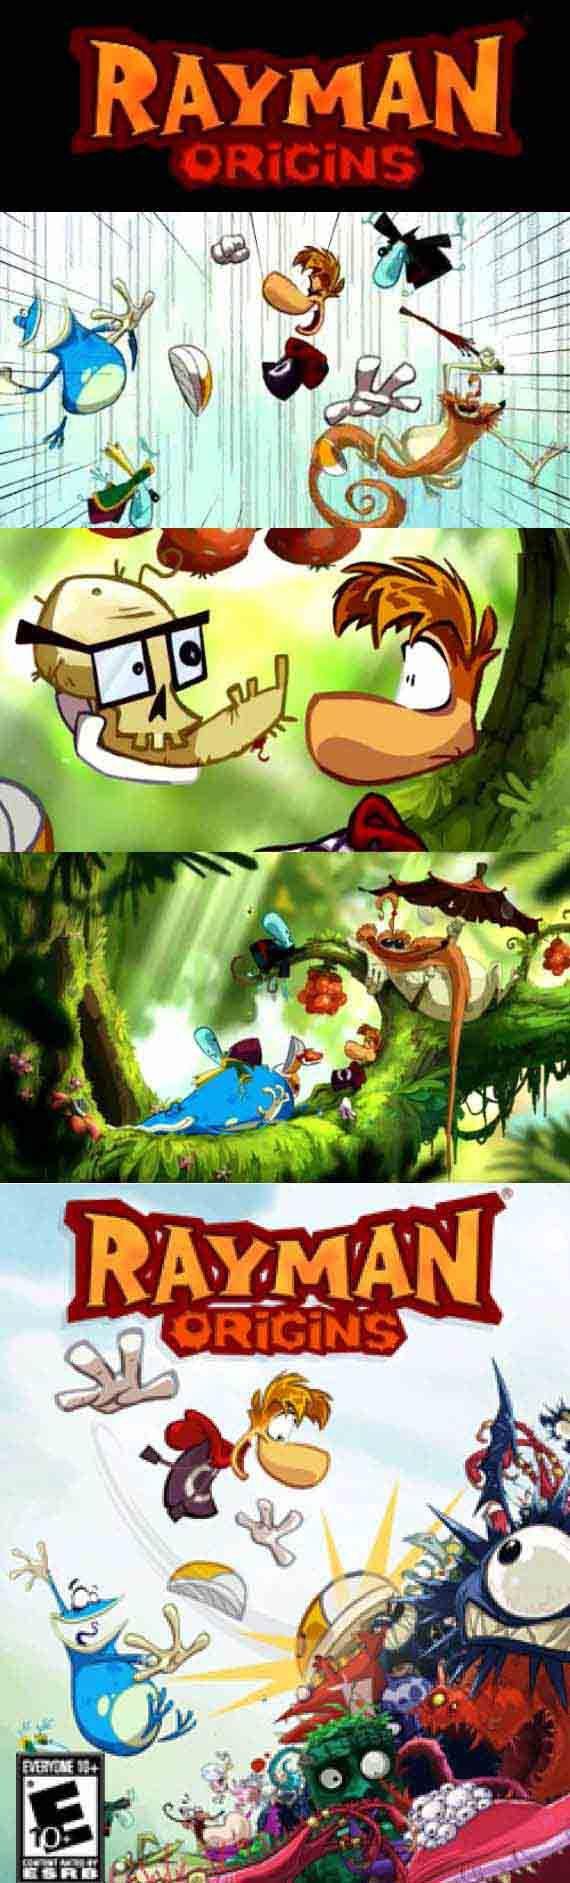 #Platformer2D #Rayman Origins $9.99 until April 3 http://www.levelgamingground.com/rayman-origins-review.html https://www.humblebundle.com/store/rayman-origins